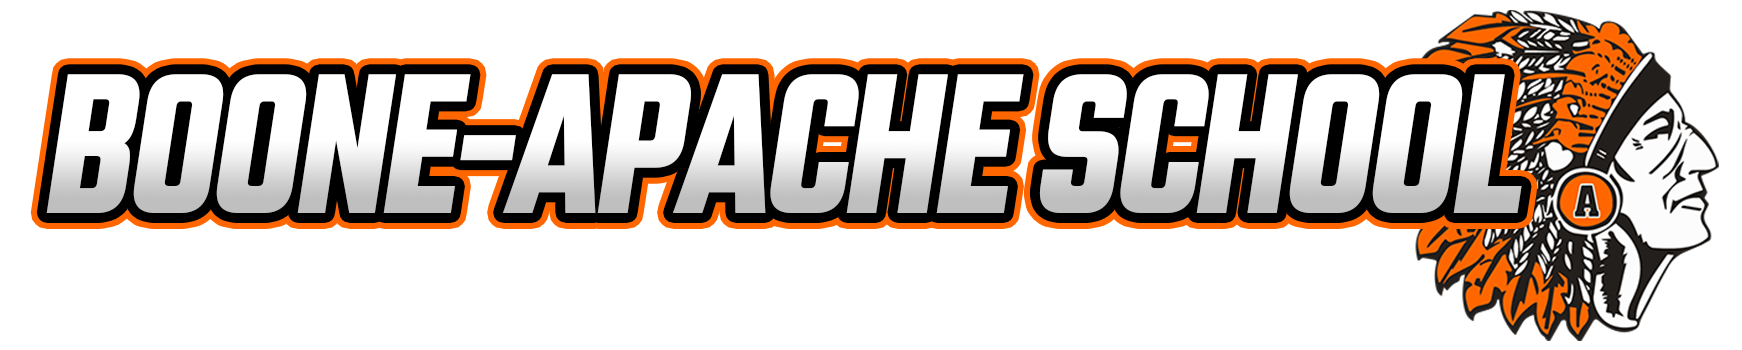 Boone-Apache Public SchoolsLogo